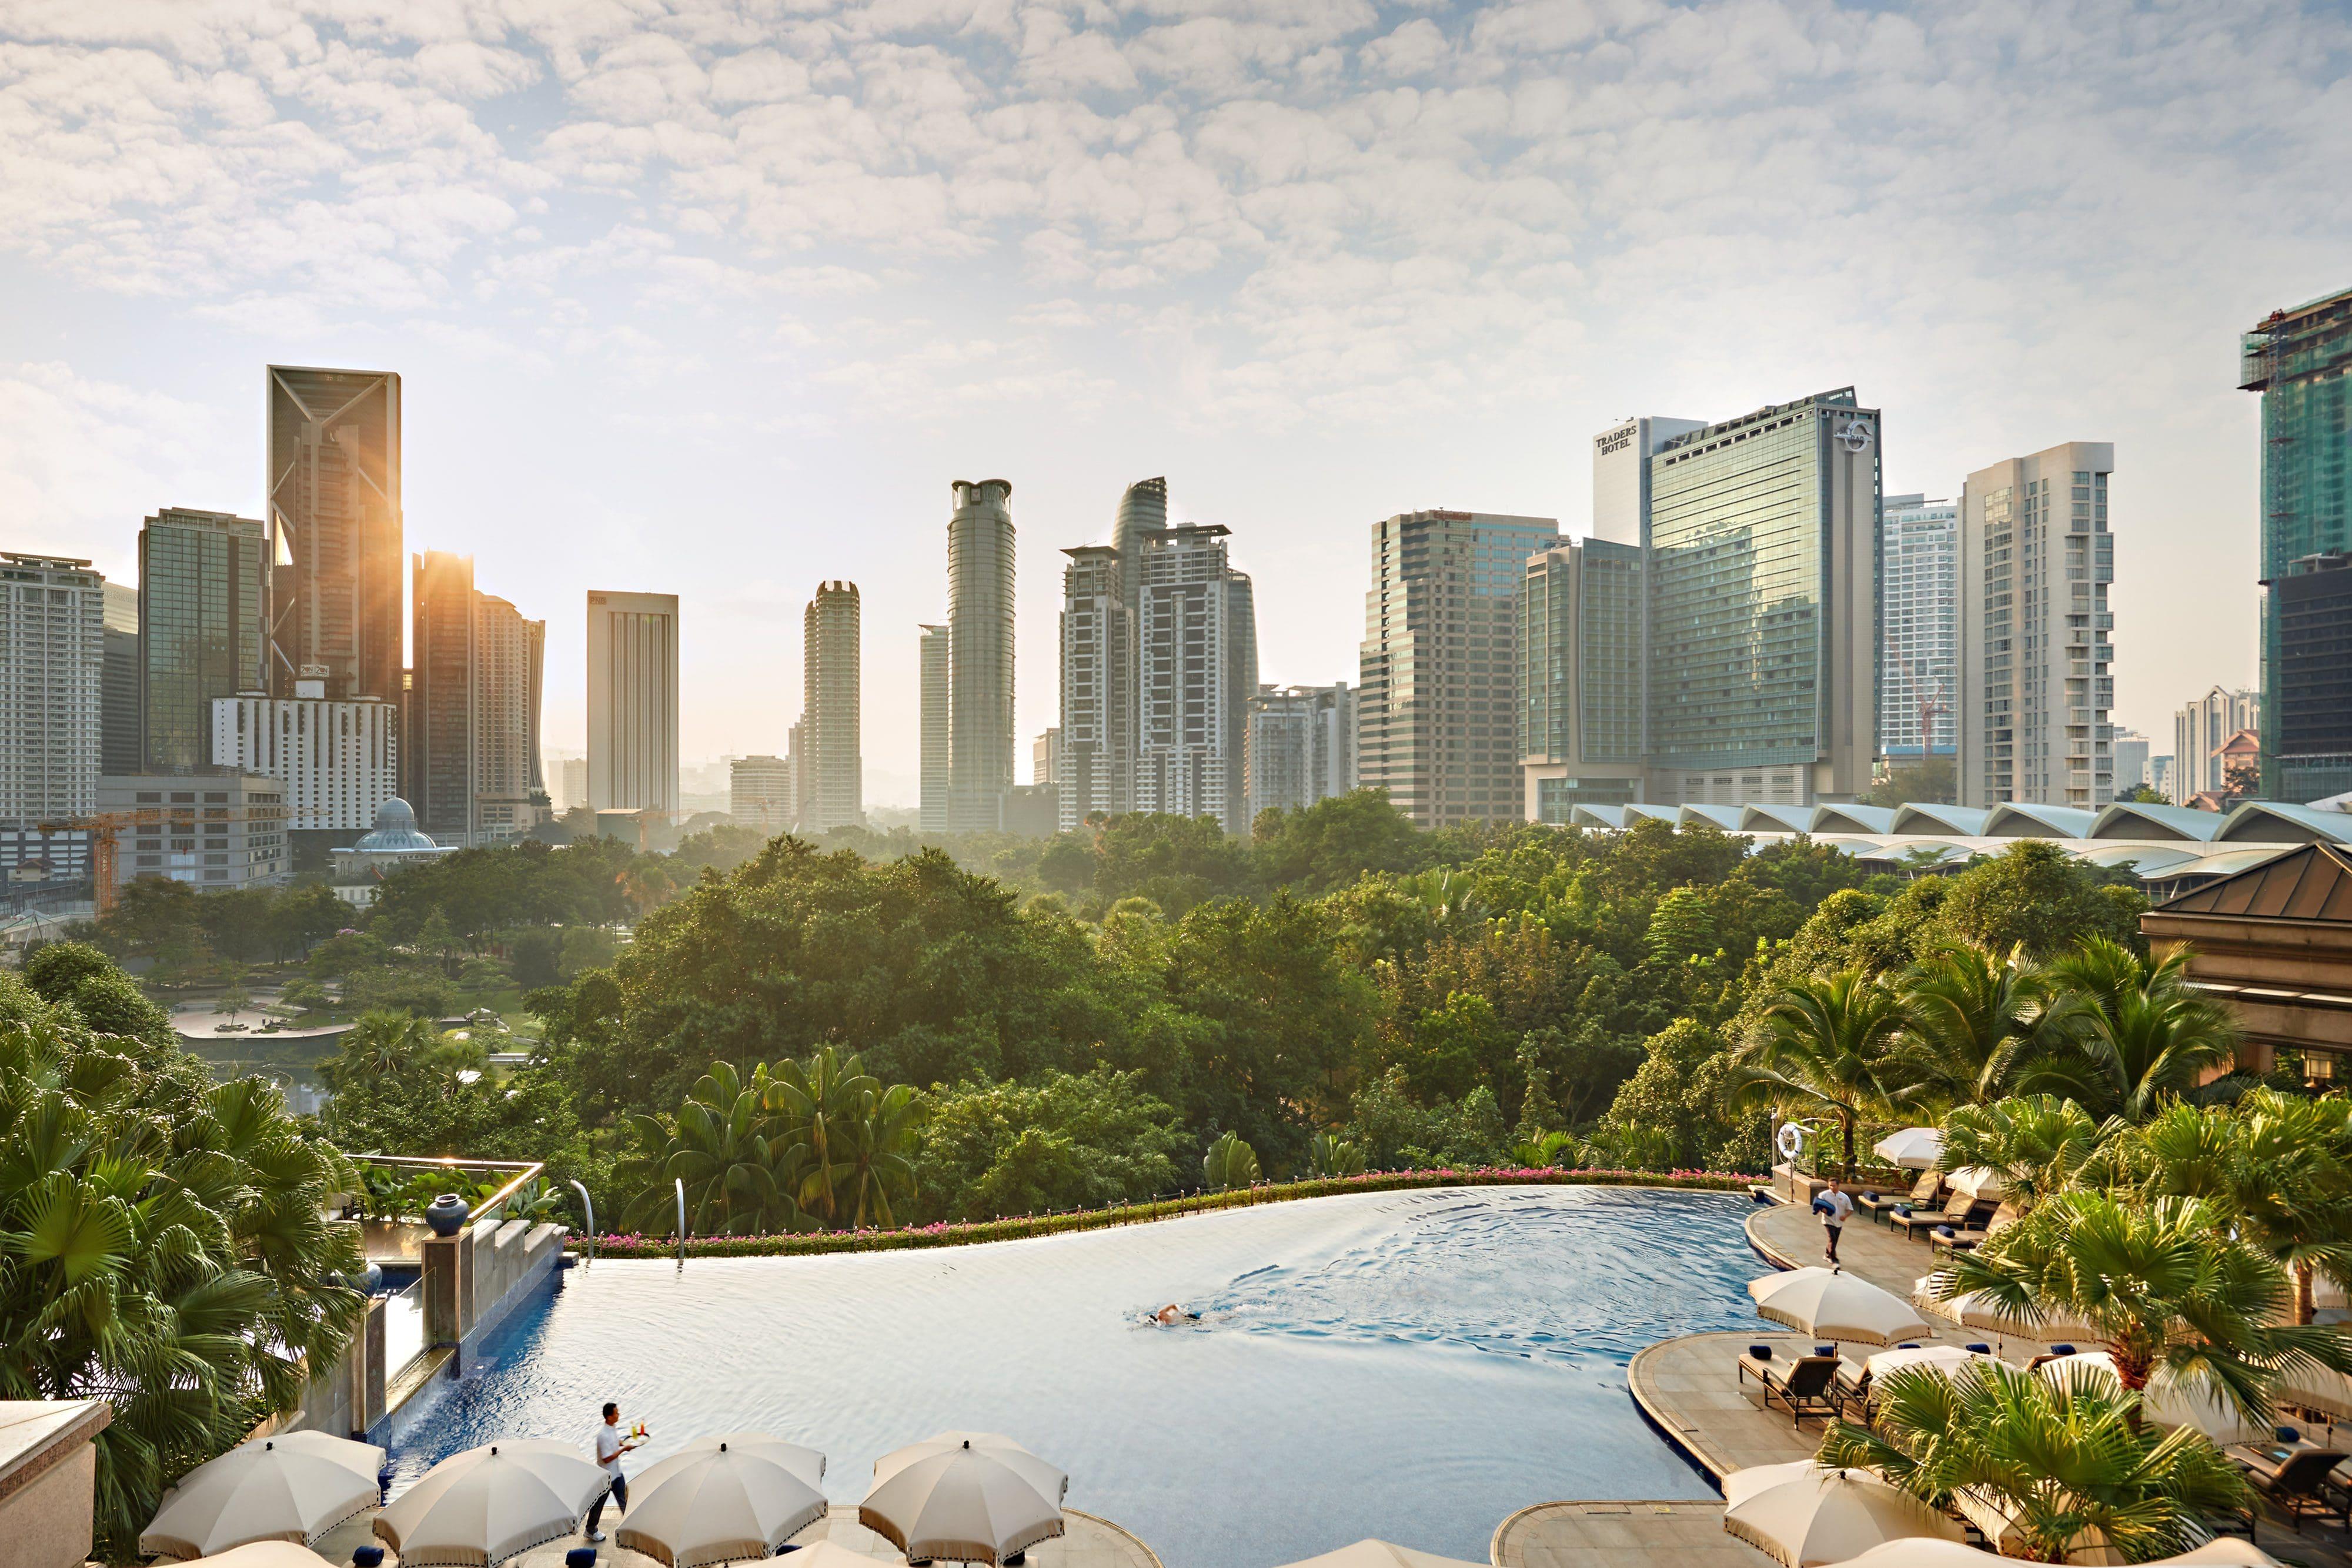 Mandarin Oriental's swimming pool